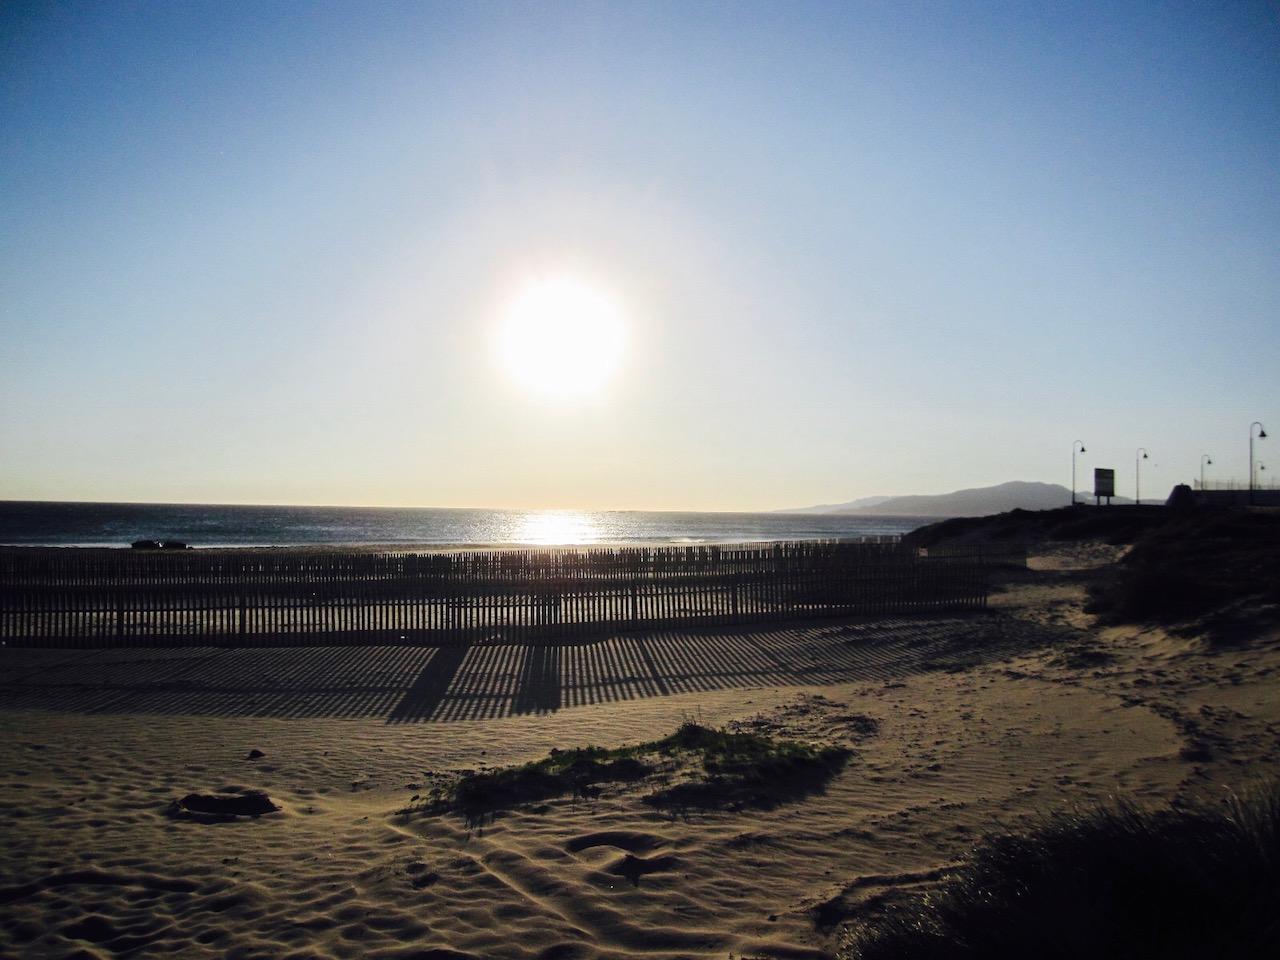 Sonnenuntergang am Strand in Tarifa, Andalusien